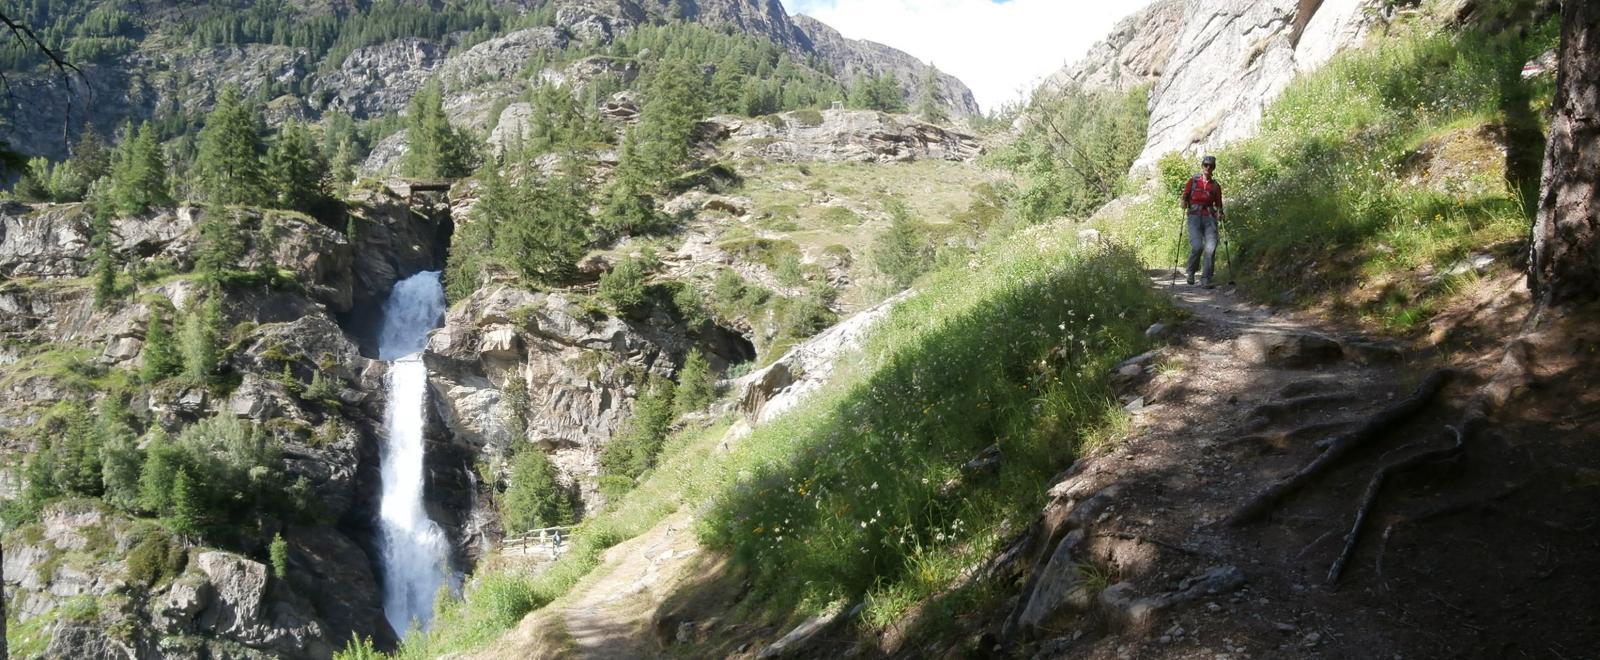 quasi arrivati a Lillaz,l'omonima cascata....